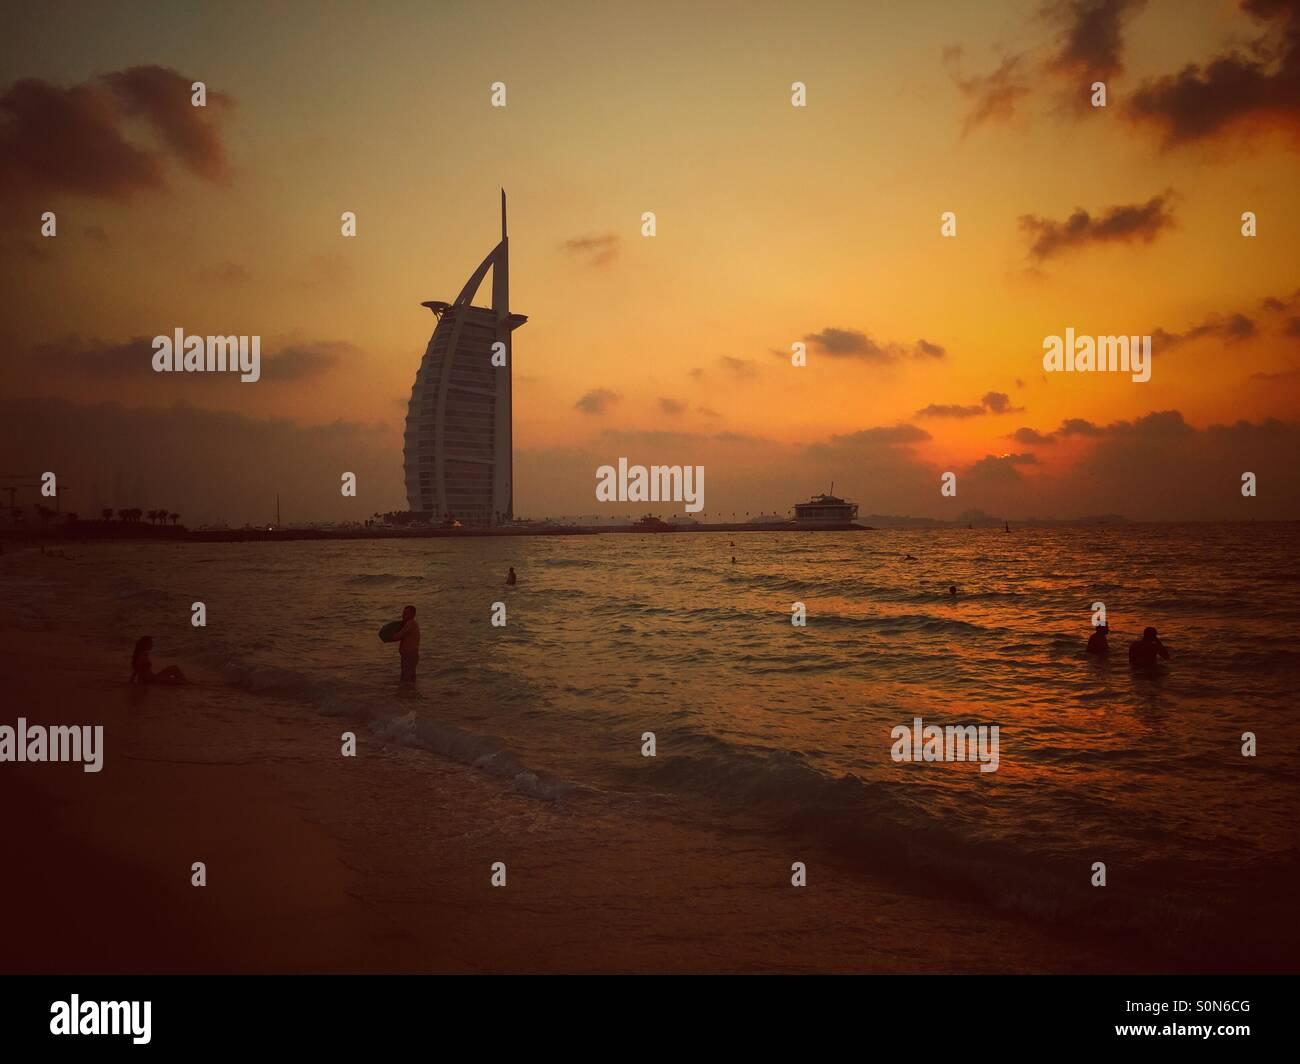 El Burj Al Arab Jumeirah Beach Dubai EMIRATOS ÁRABES UNIDOS Foto de stock